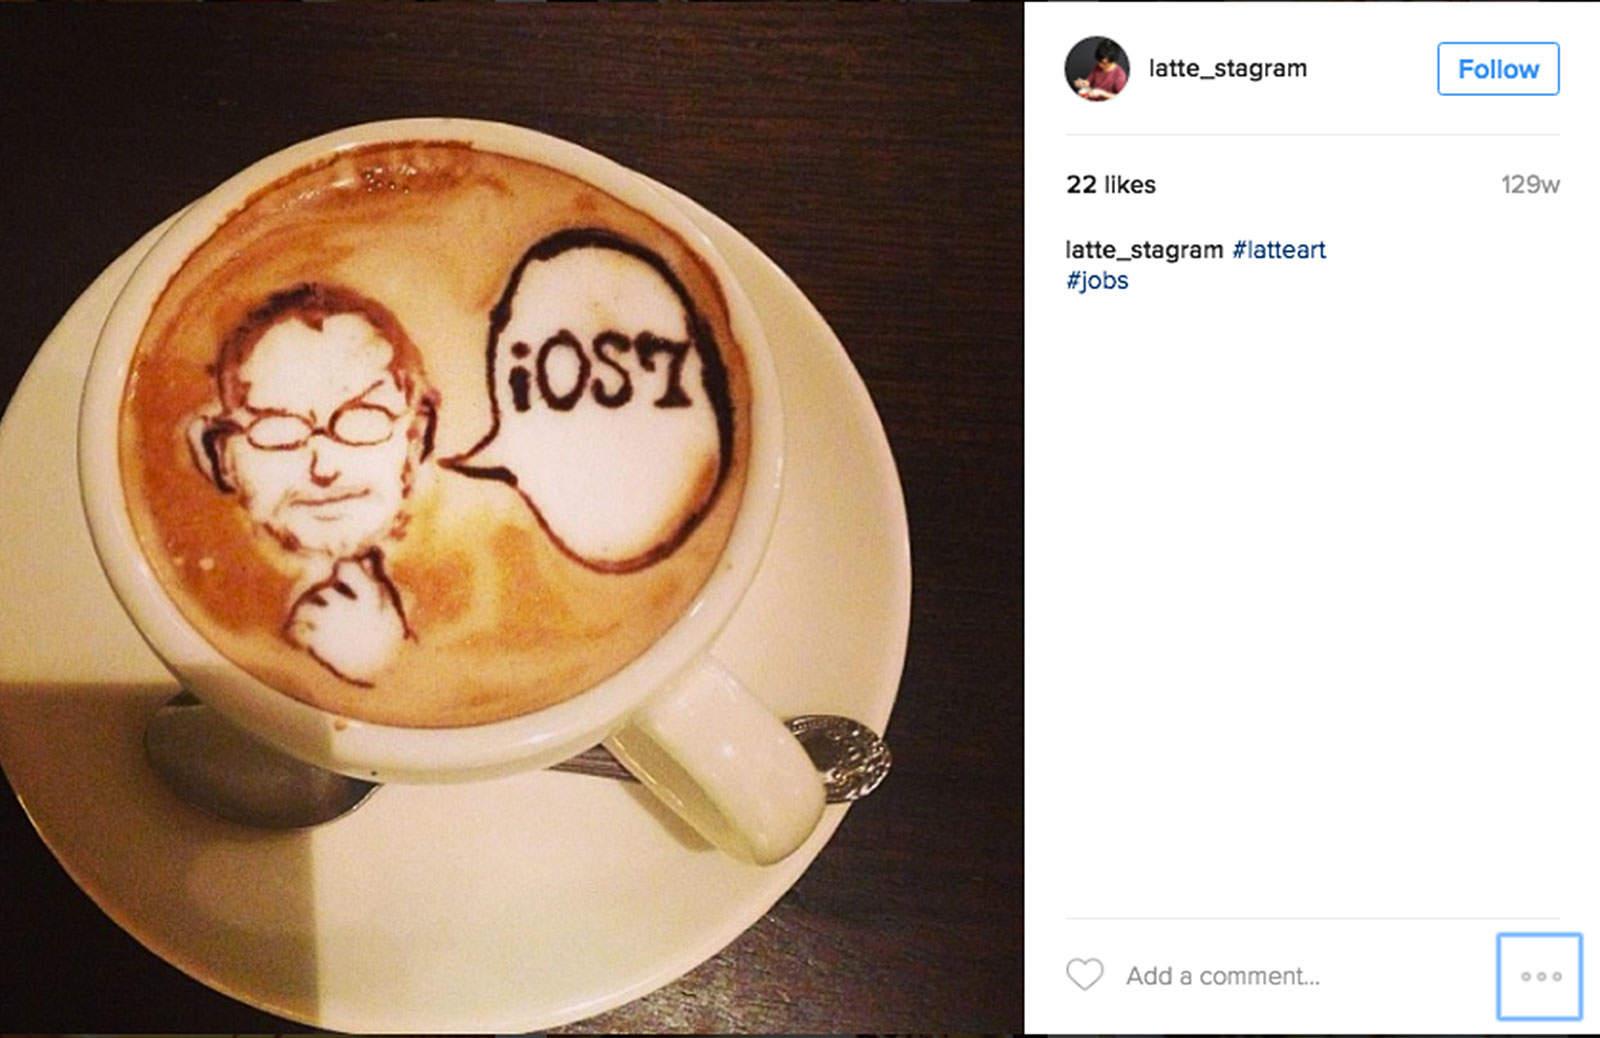 Steve Jobs appears from a swirl of milk and coffee in latte art by Kohei Matsuno.